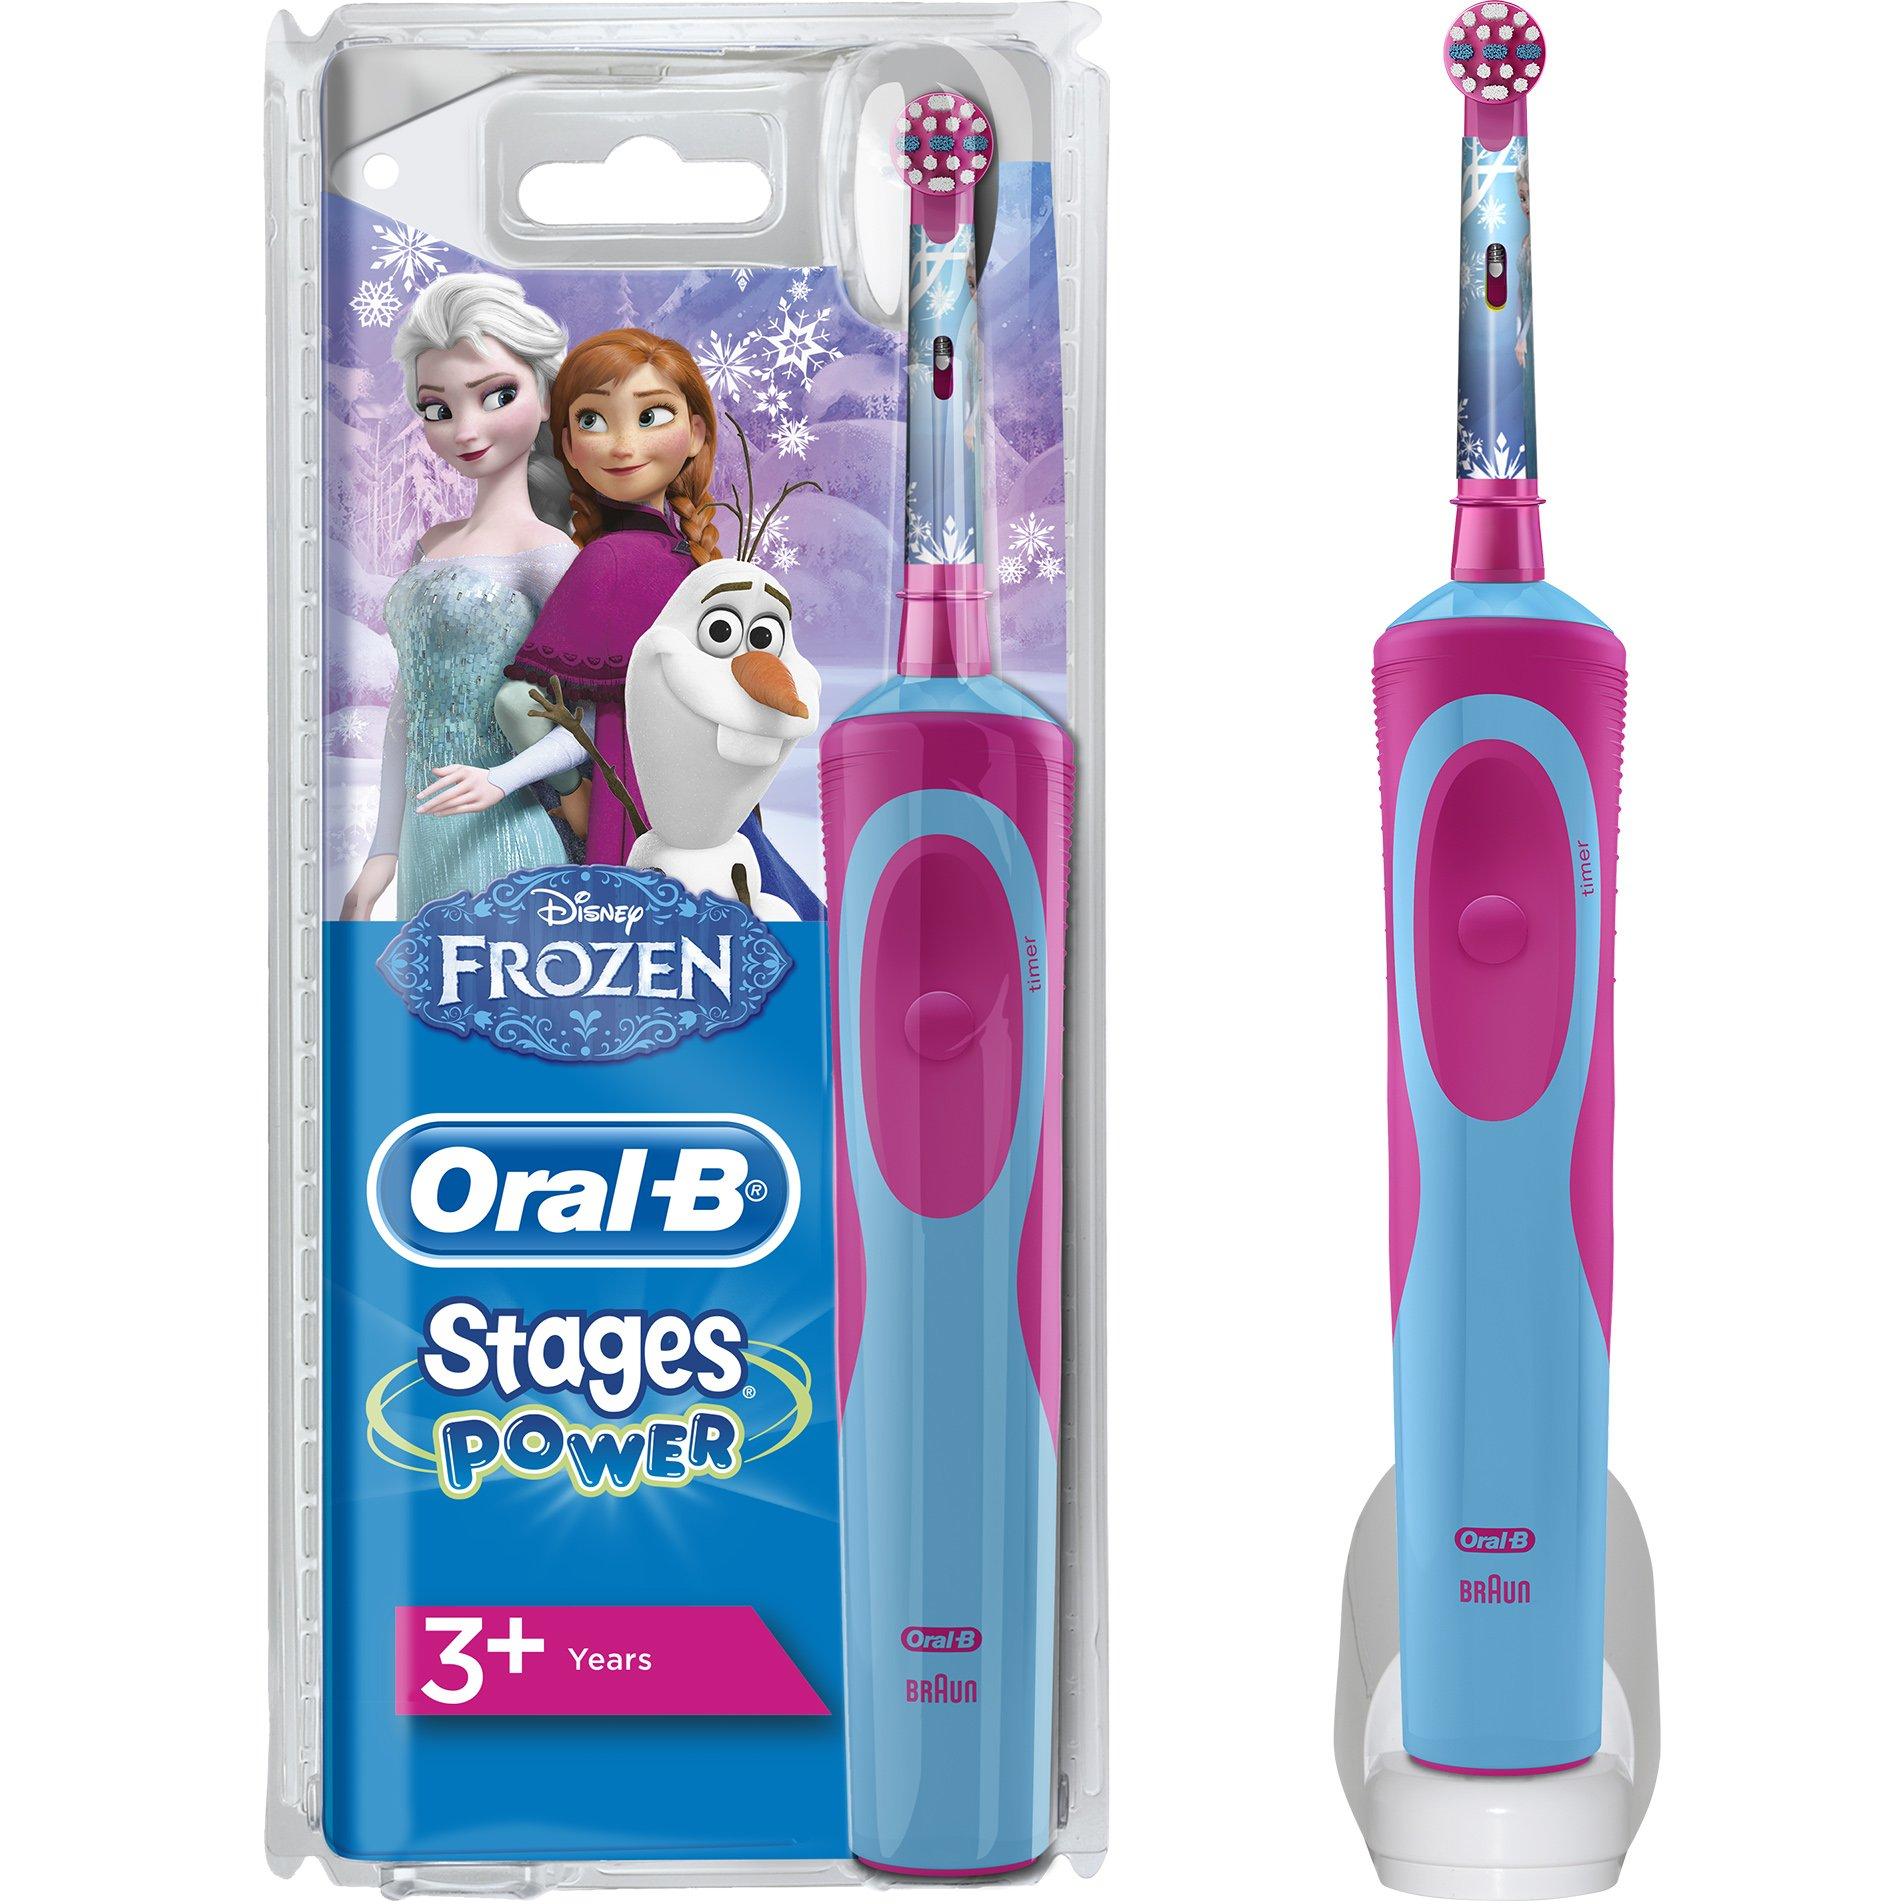 Oral-B Vitality Stages Frozen 3+ years Παιδική Ηλεκτρική Οδοντόβουρτσα προσφορές   δώρα  amp  προσφορές pharm24 gr   summer sales